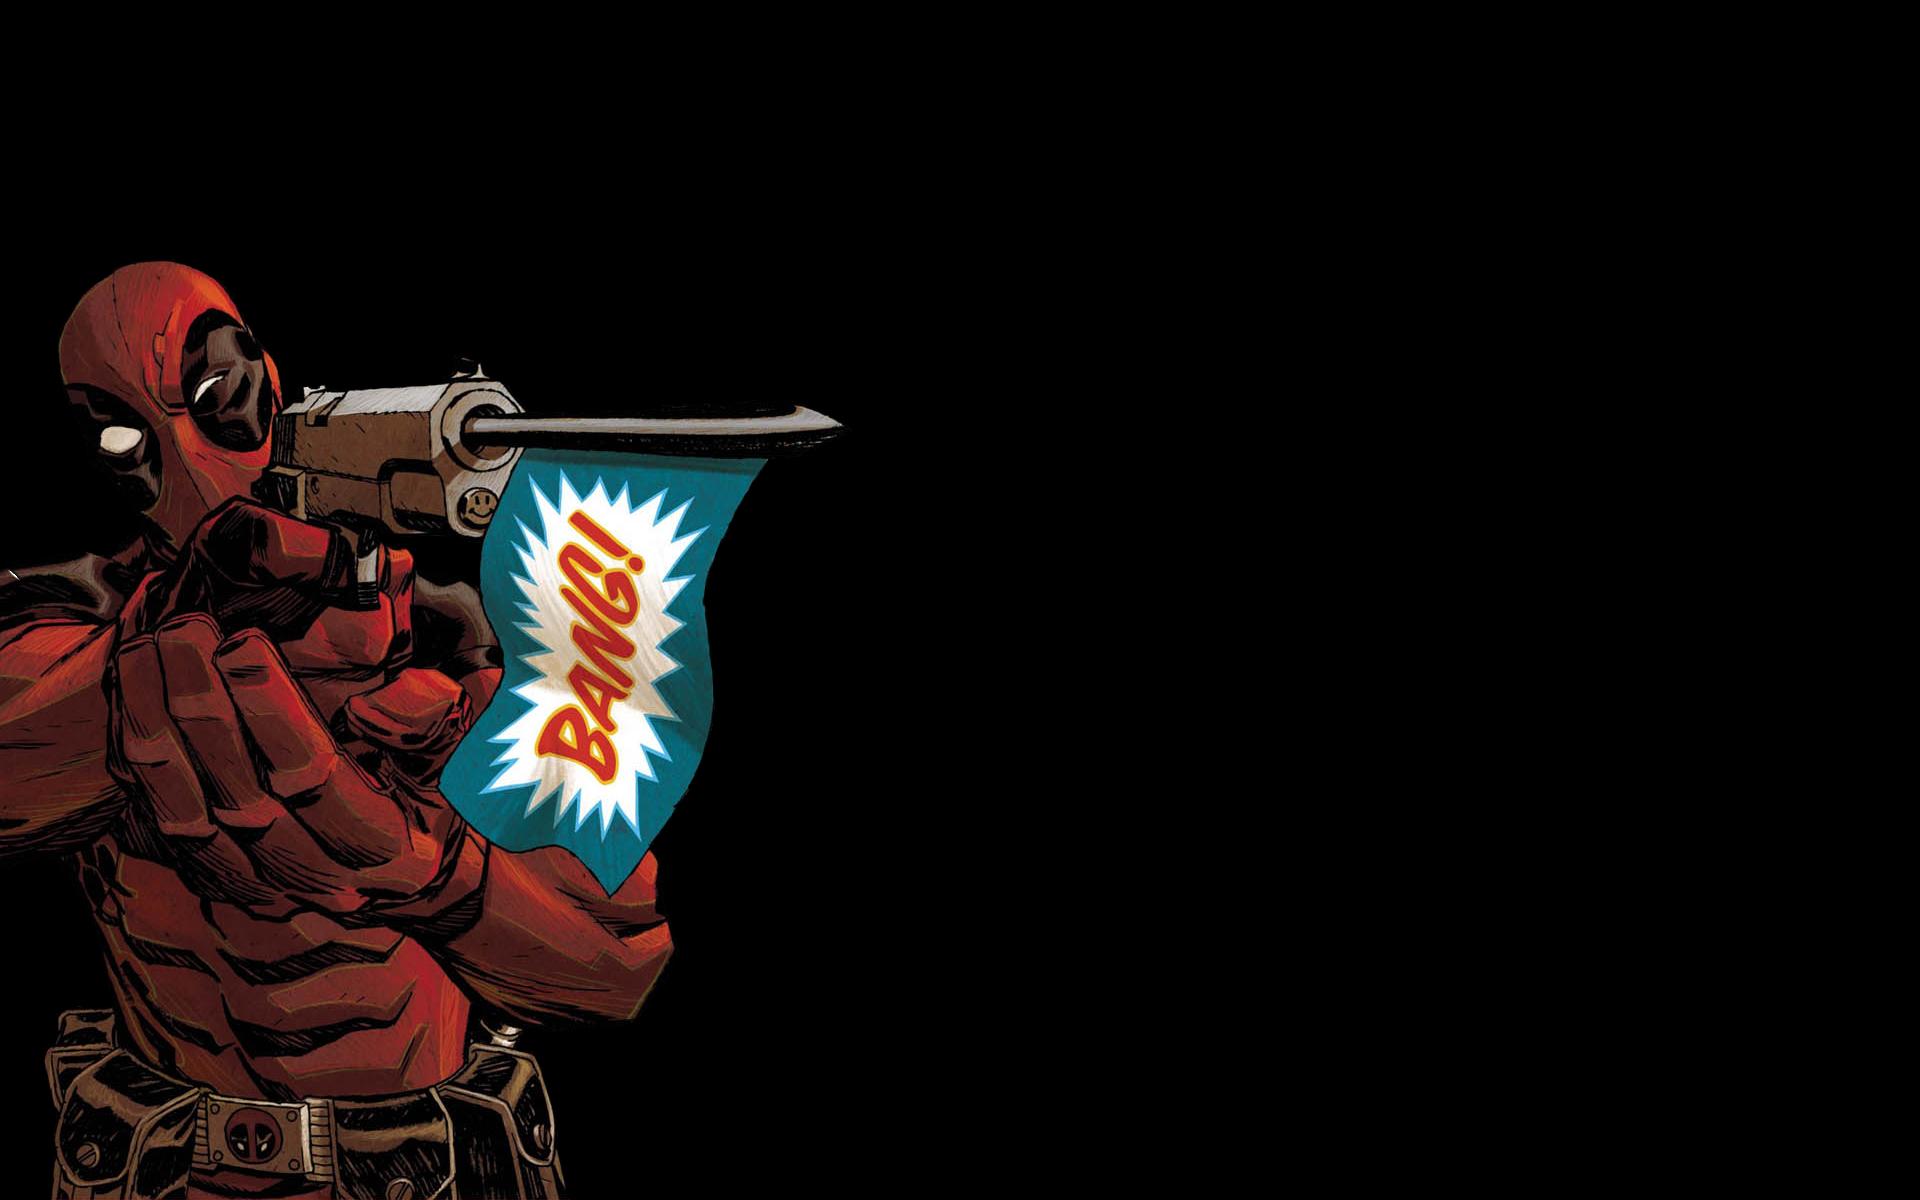 deadpool comic art wallpapers hd desktop and mobile